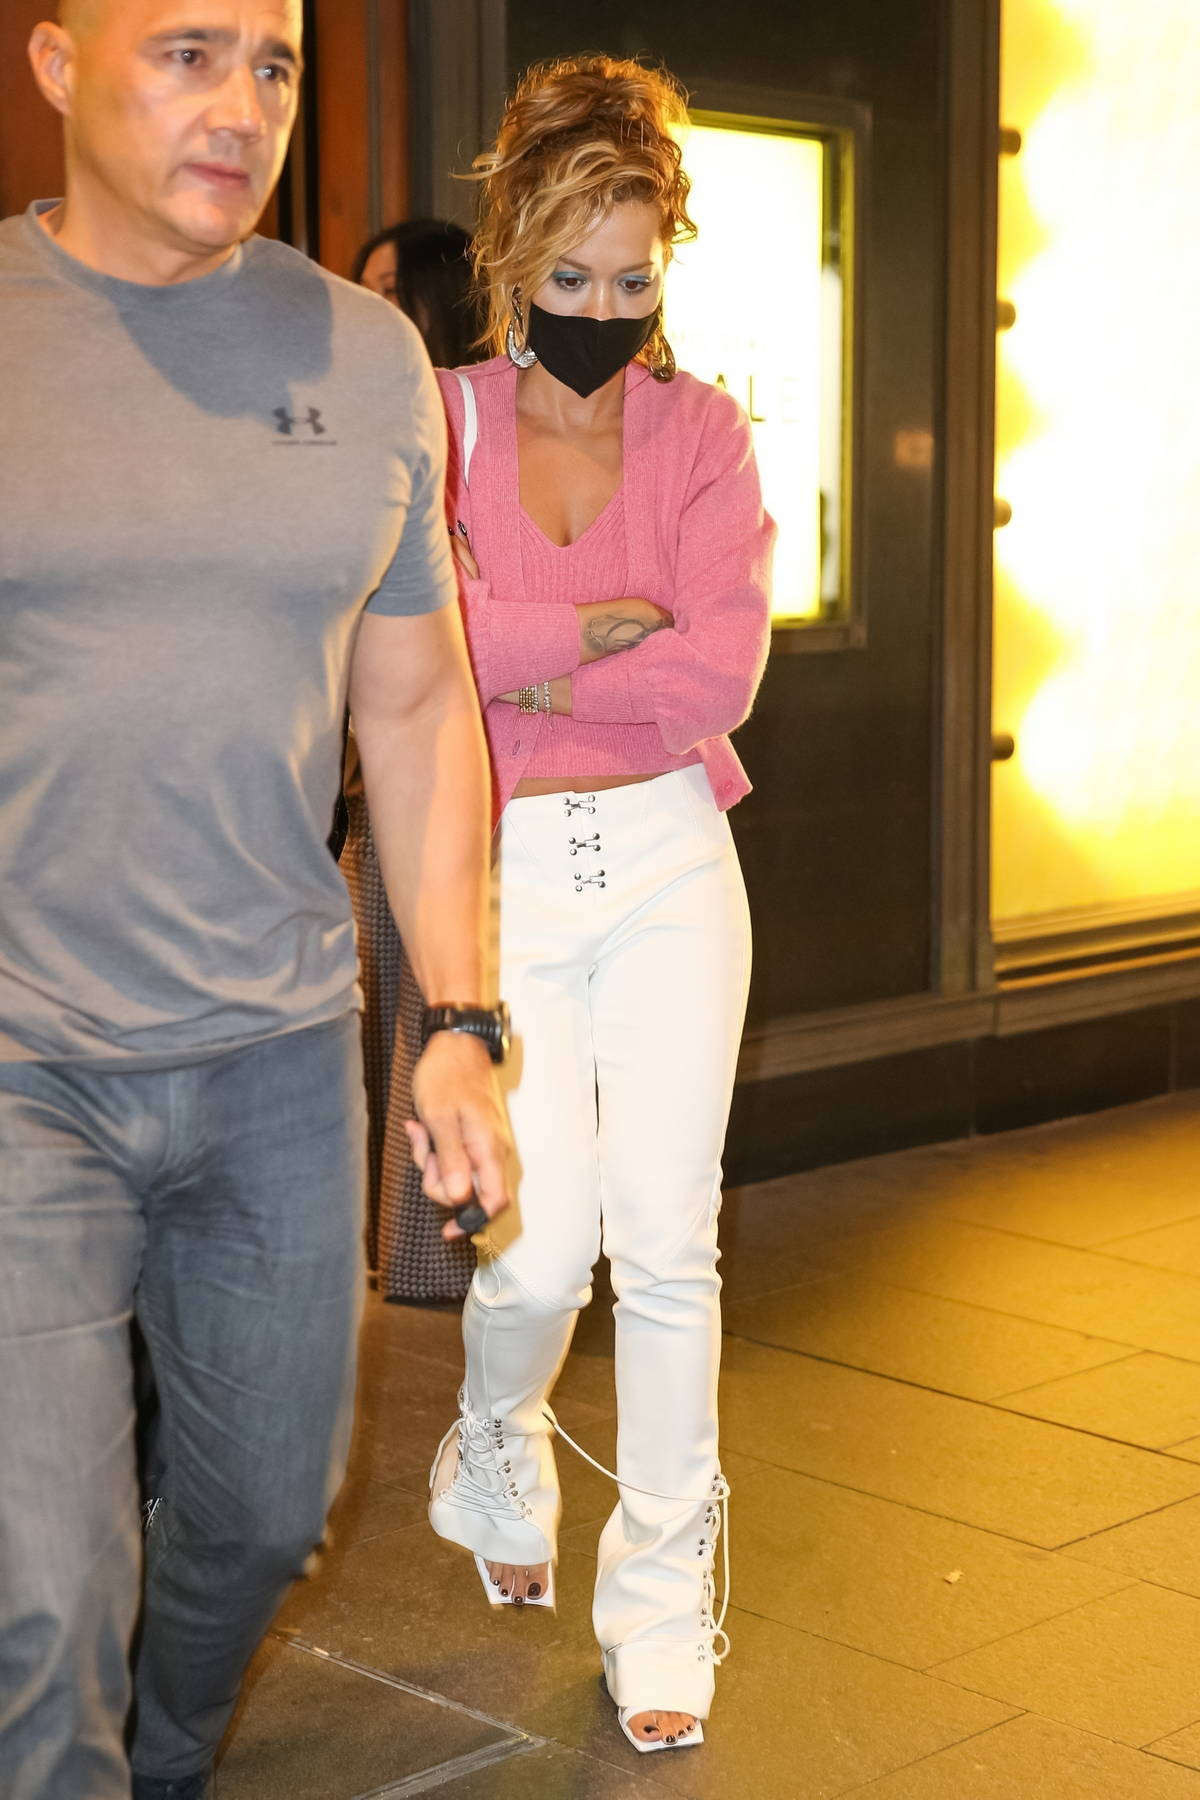 Rita Ora, Isla Fisher, Elsa Pataky, and Tessa Thompson seen leaving David Jones Department Store in Sydney, Australia